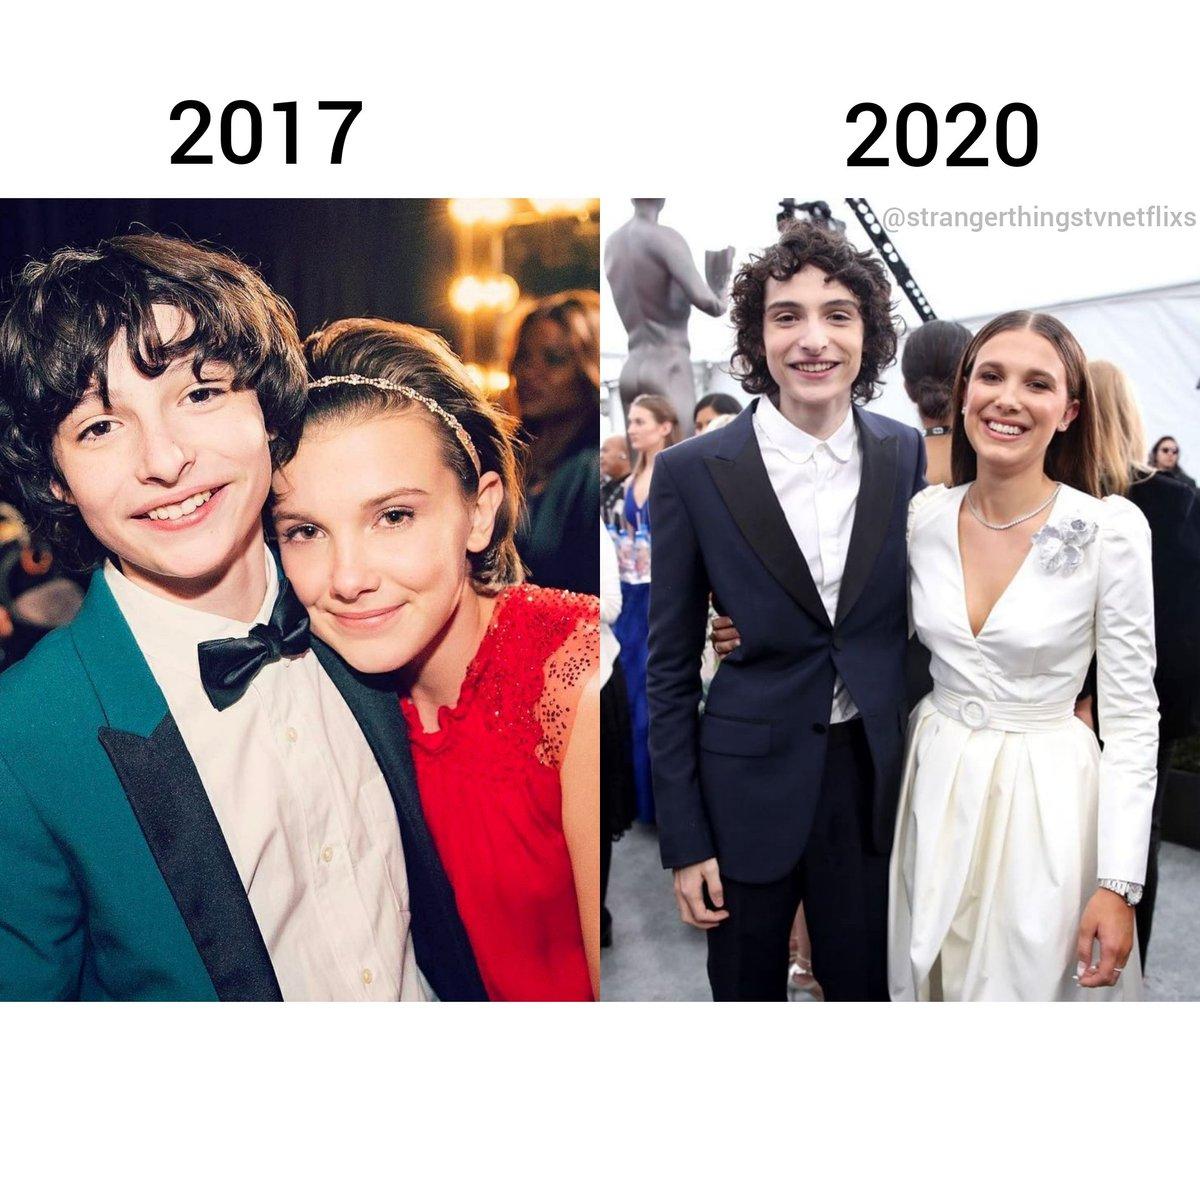 They grow up so fast ❤️#SAGAwards